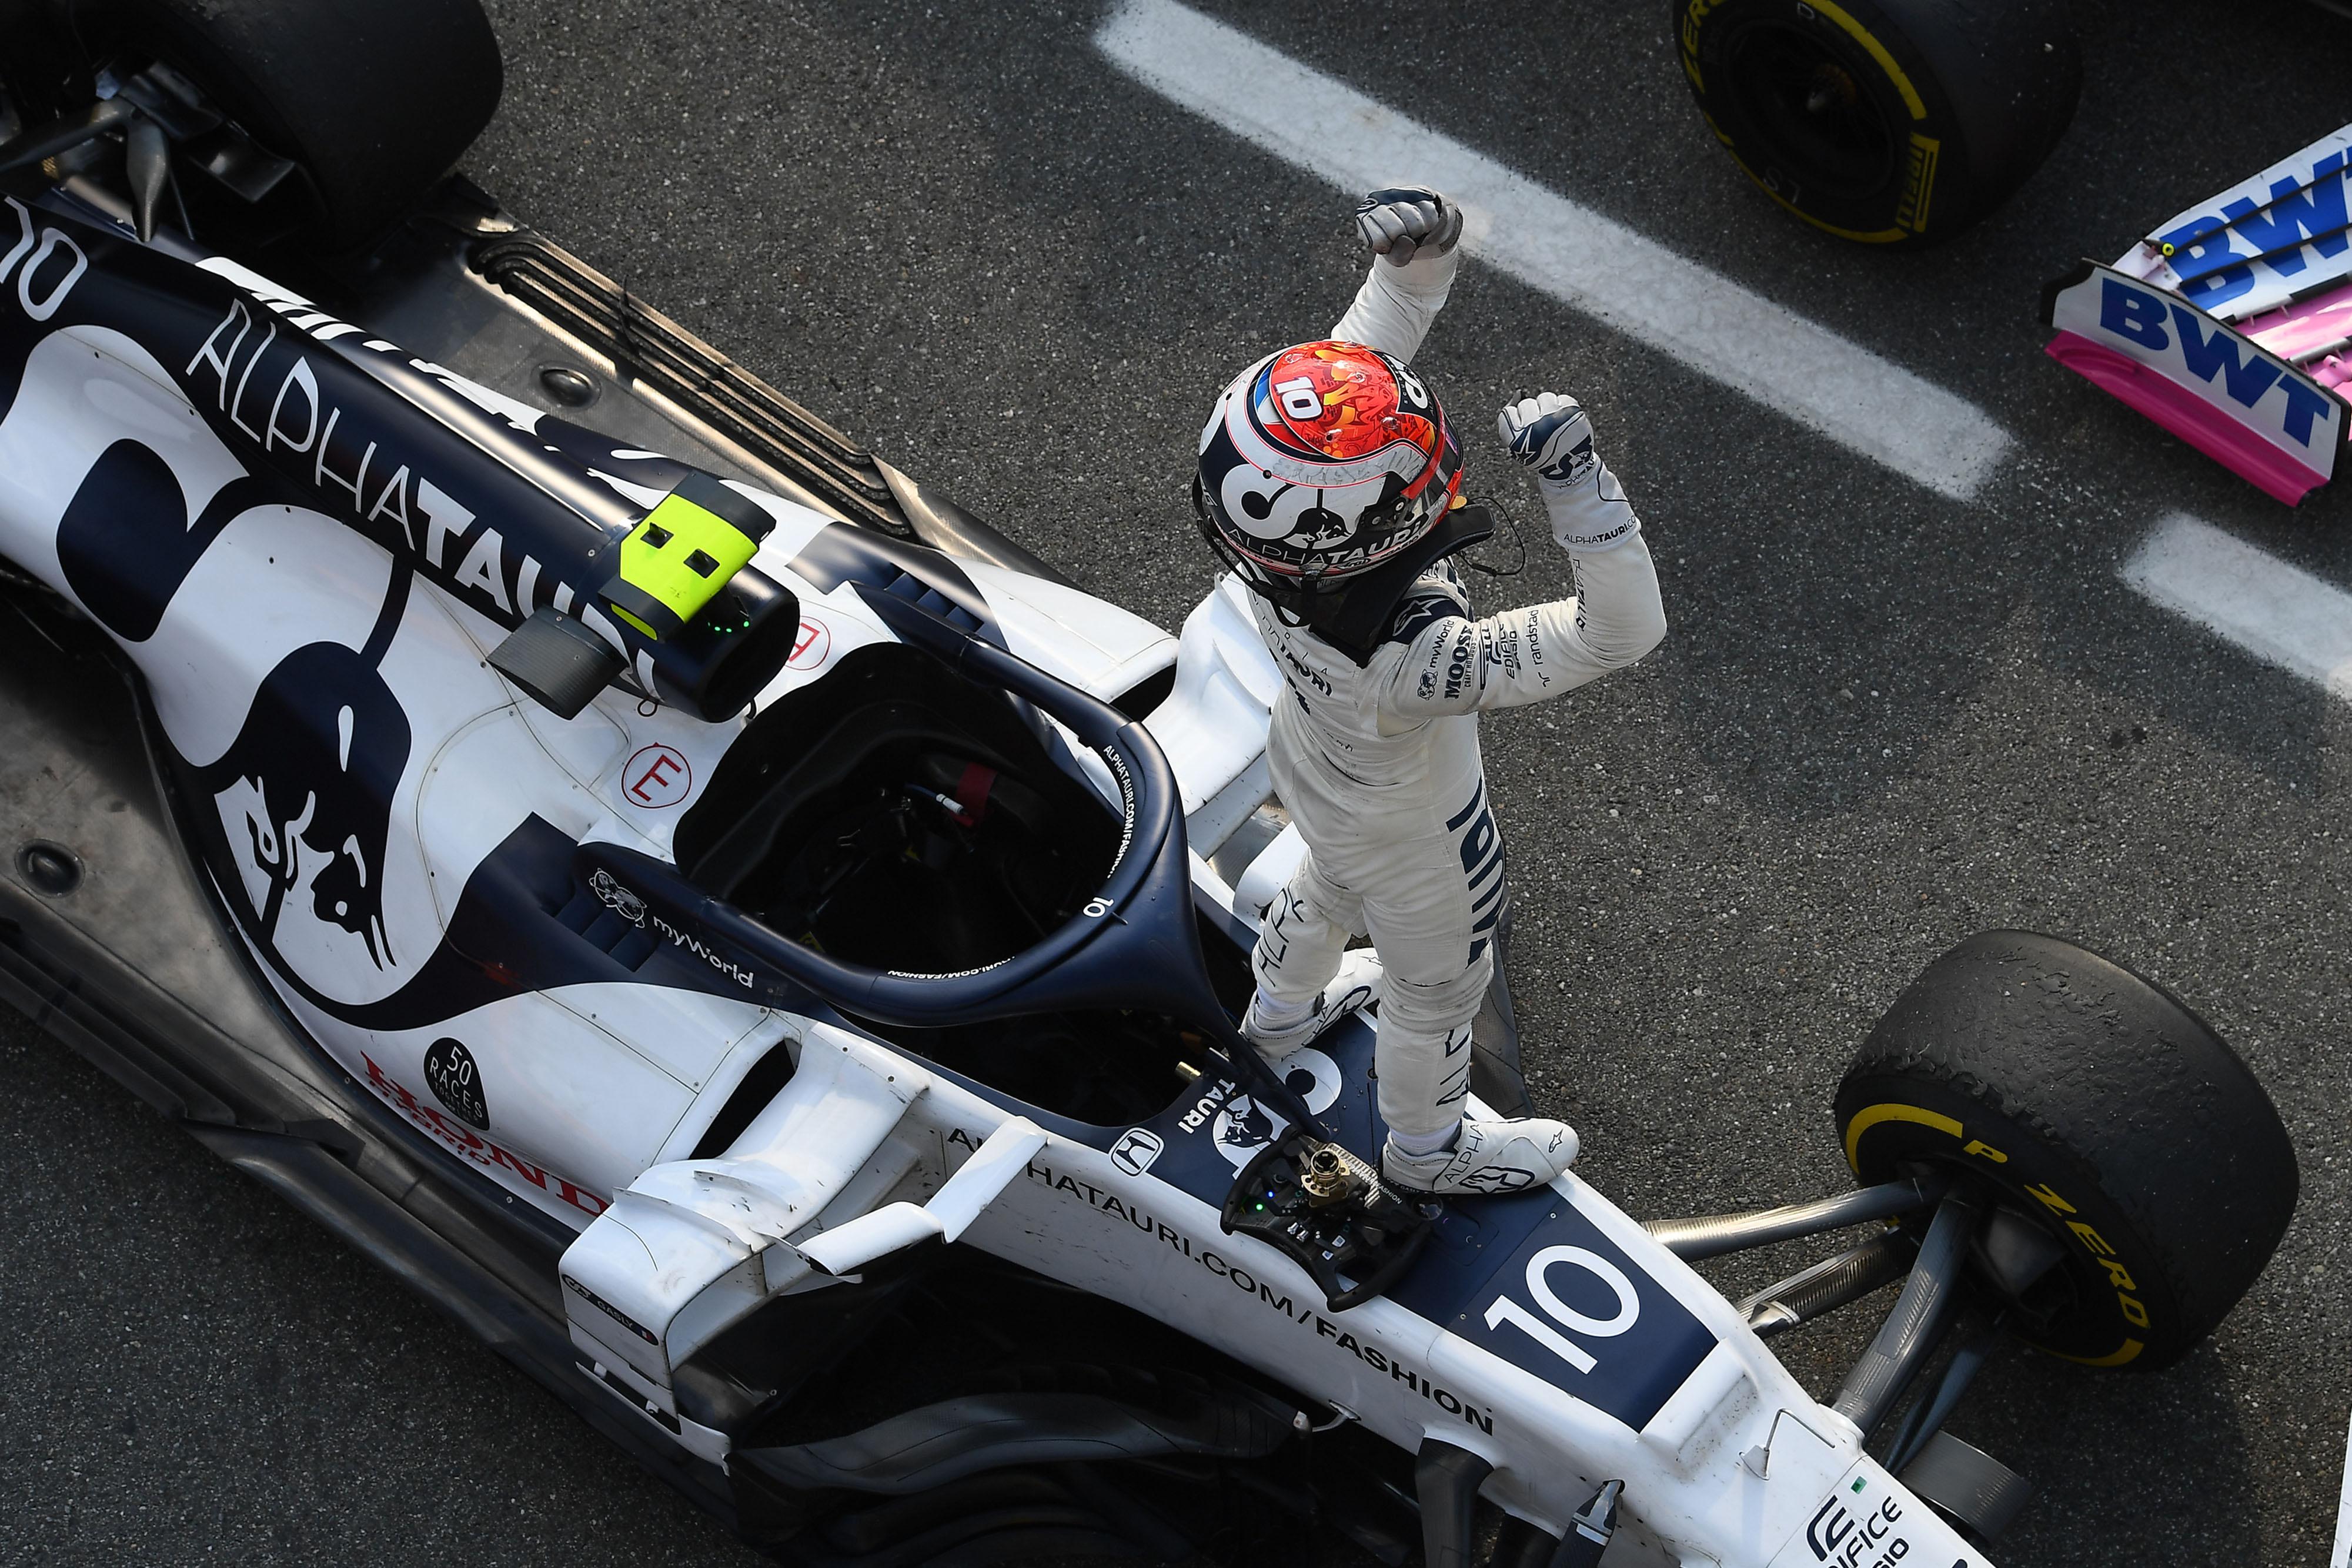 Pierre Gasly AlphaTauri wins Italian Grand Prix 2020 Monza